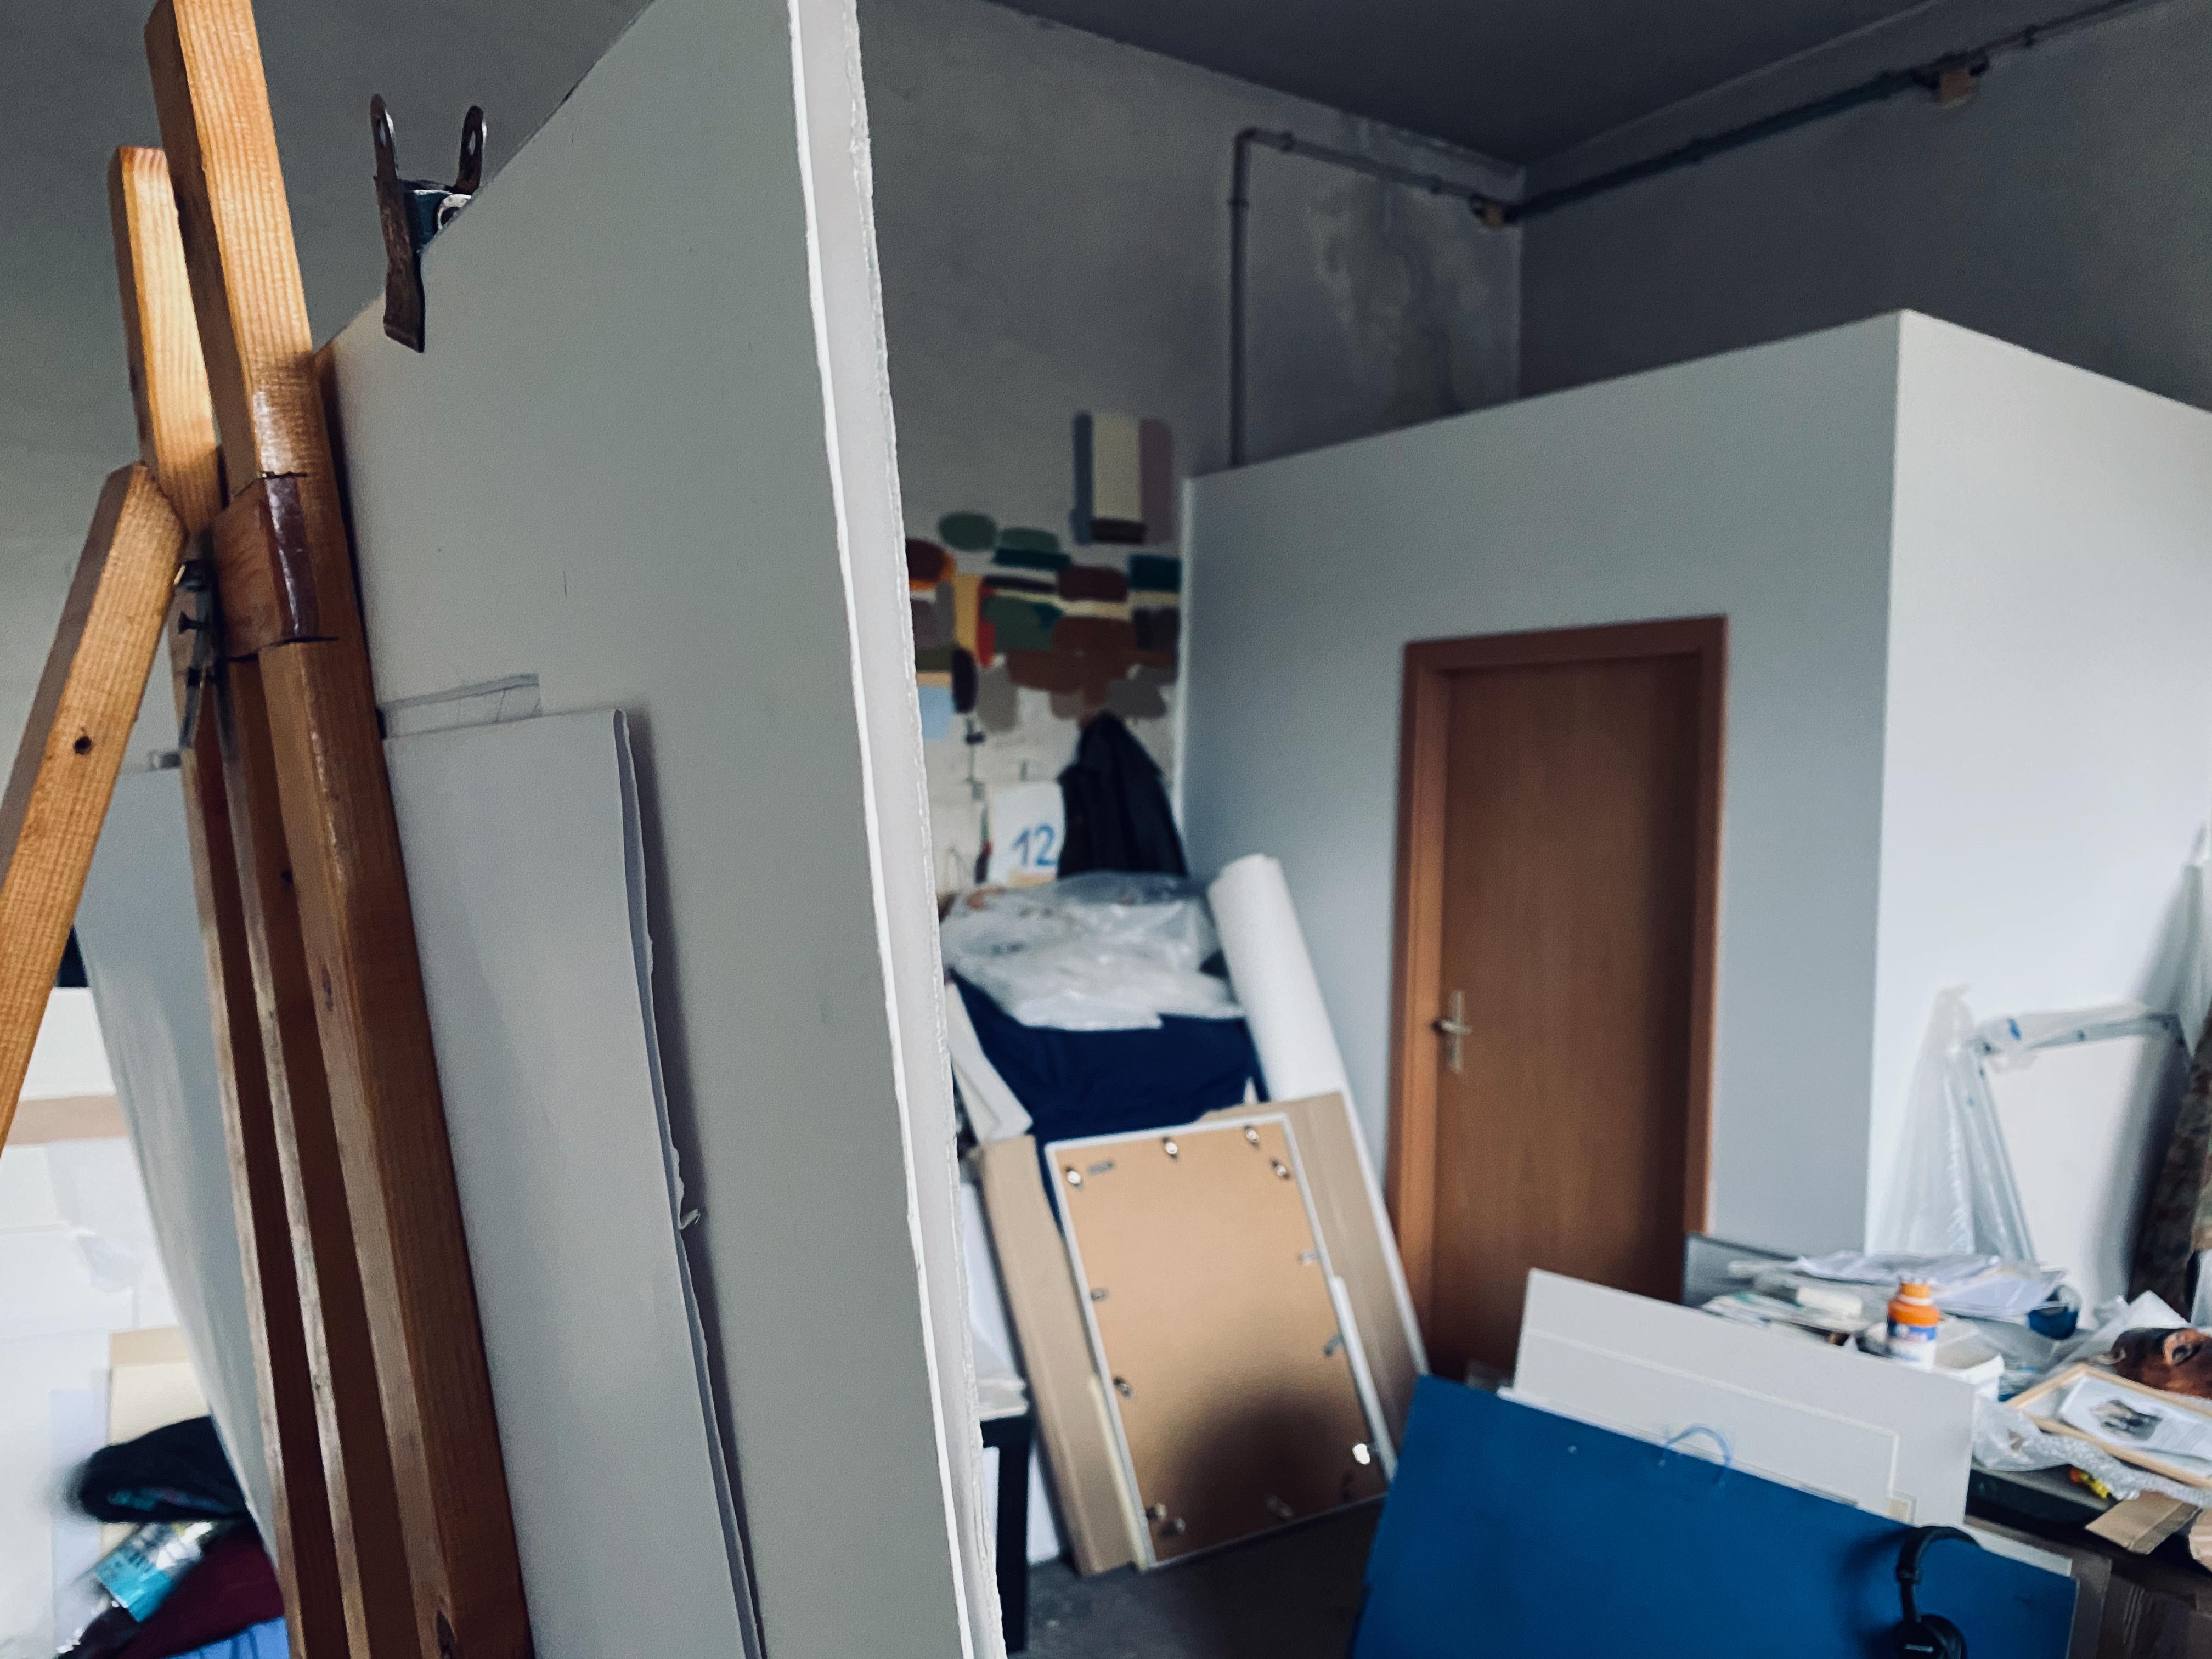 Blick ins Atelier von Horst Sakulowski